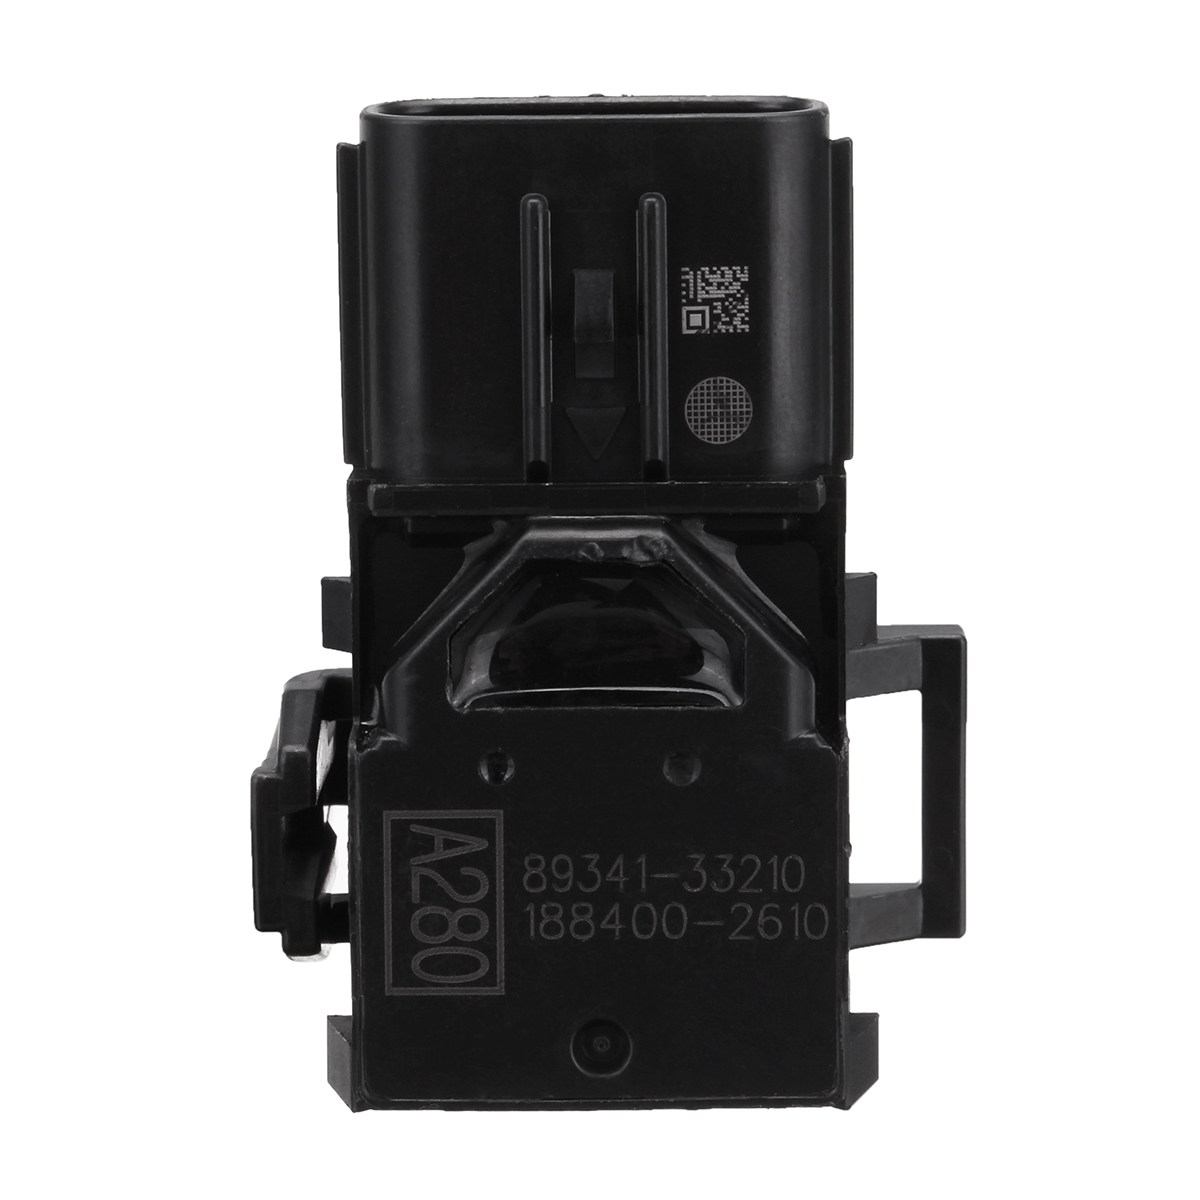 89341 33210 188400 2610 89341 33210 b6 reverse parking aid sensor radar for lexus rx450h rx350 f sport base 3 5l v6 2013 2014 in parking sensors from  [ 1200 x 1200 Pixel ]